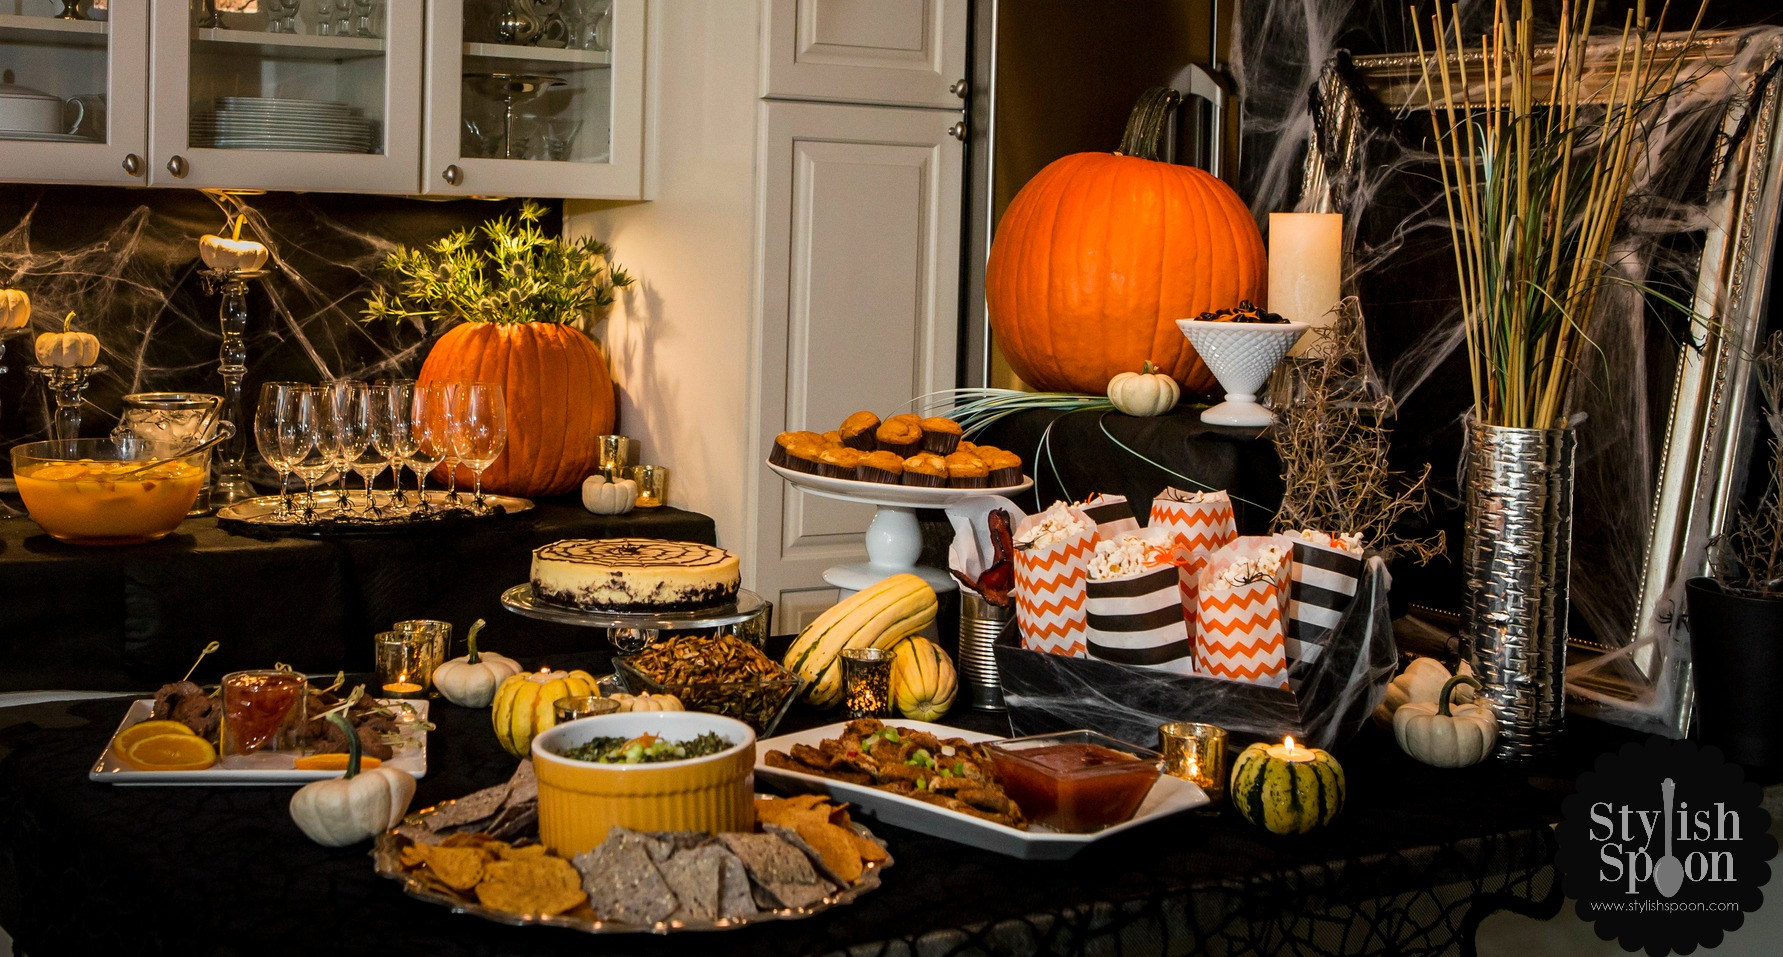 Menu Halloween Cocktail Party Stylish Spoon